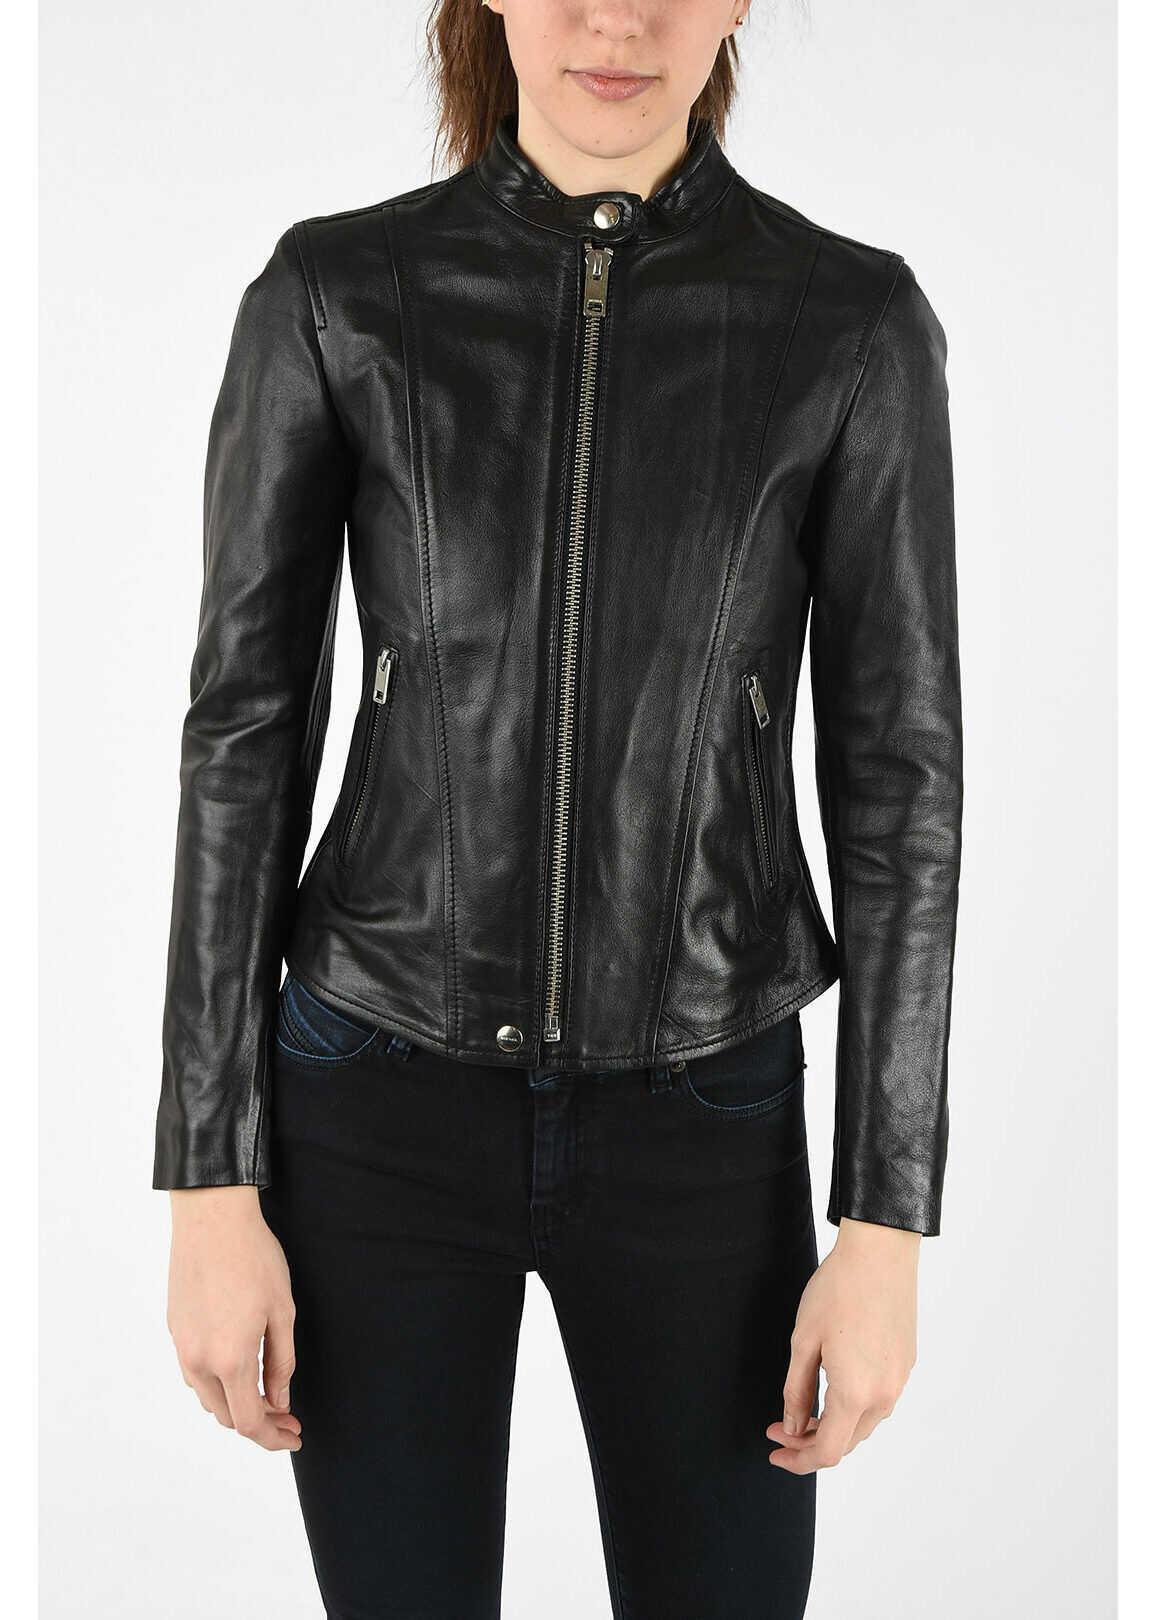 Diesel Leather L-SPEZY Jacket BLACK